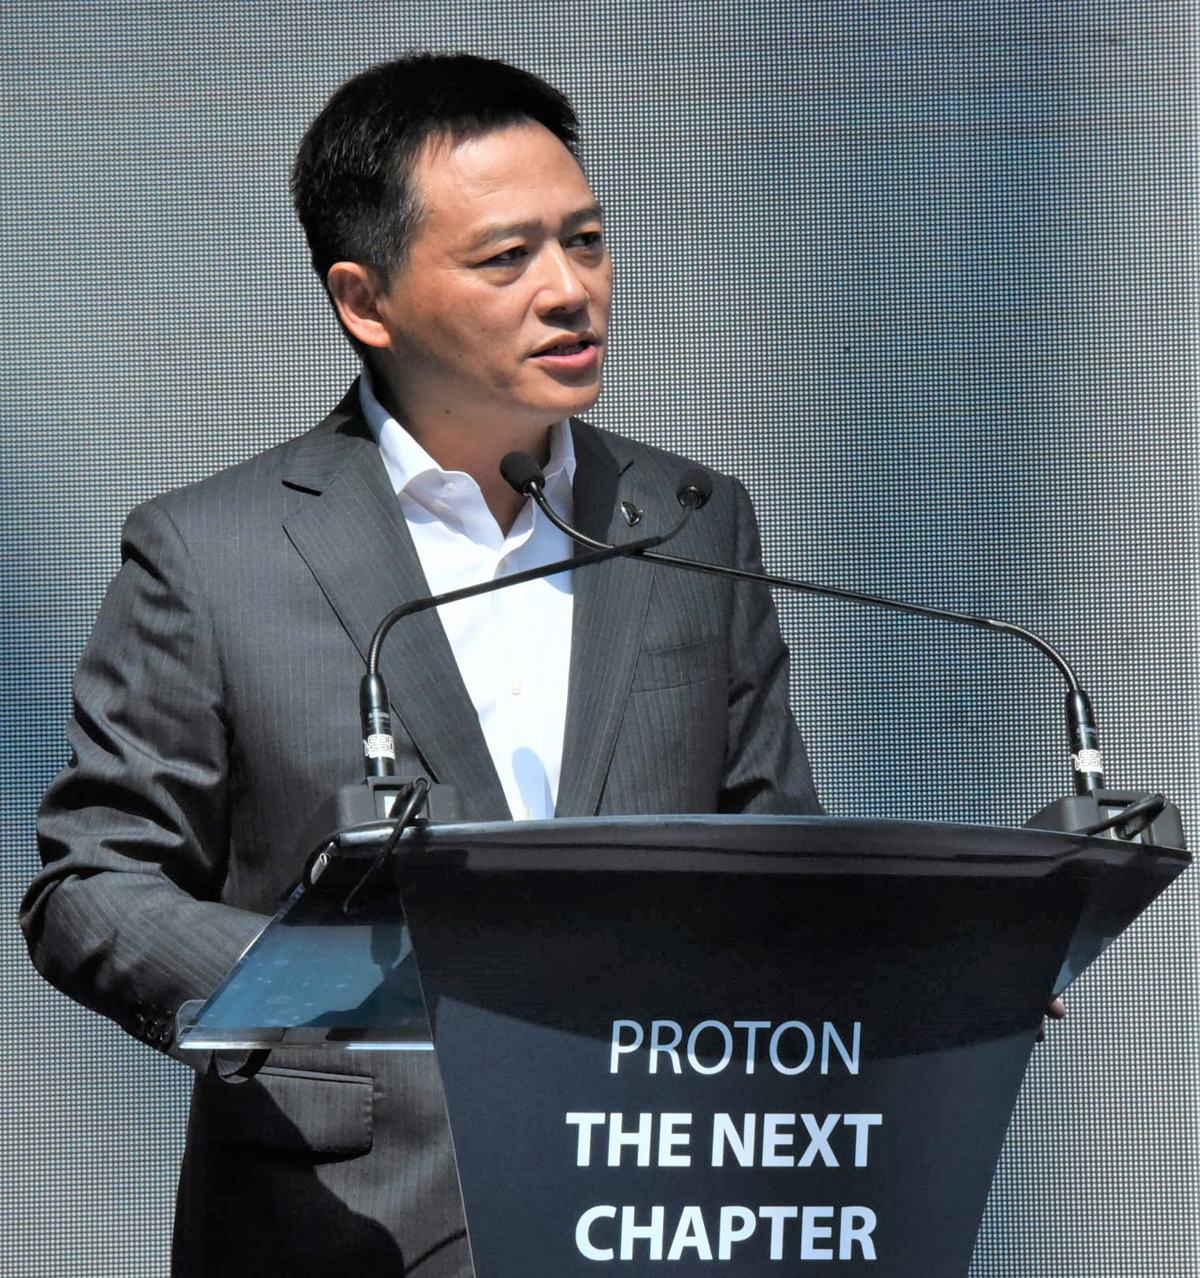 Proton 销量增长至46%,总销量达到79,833辆